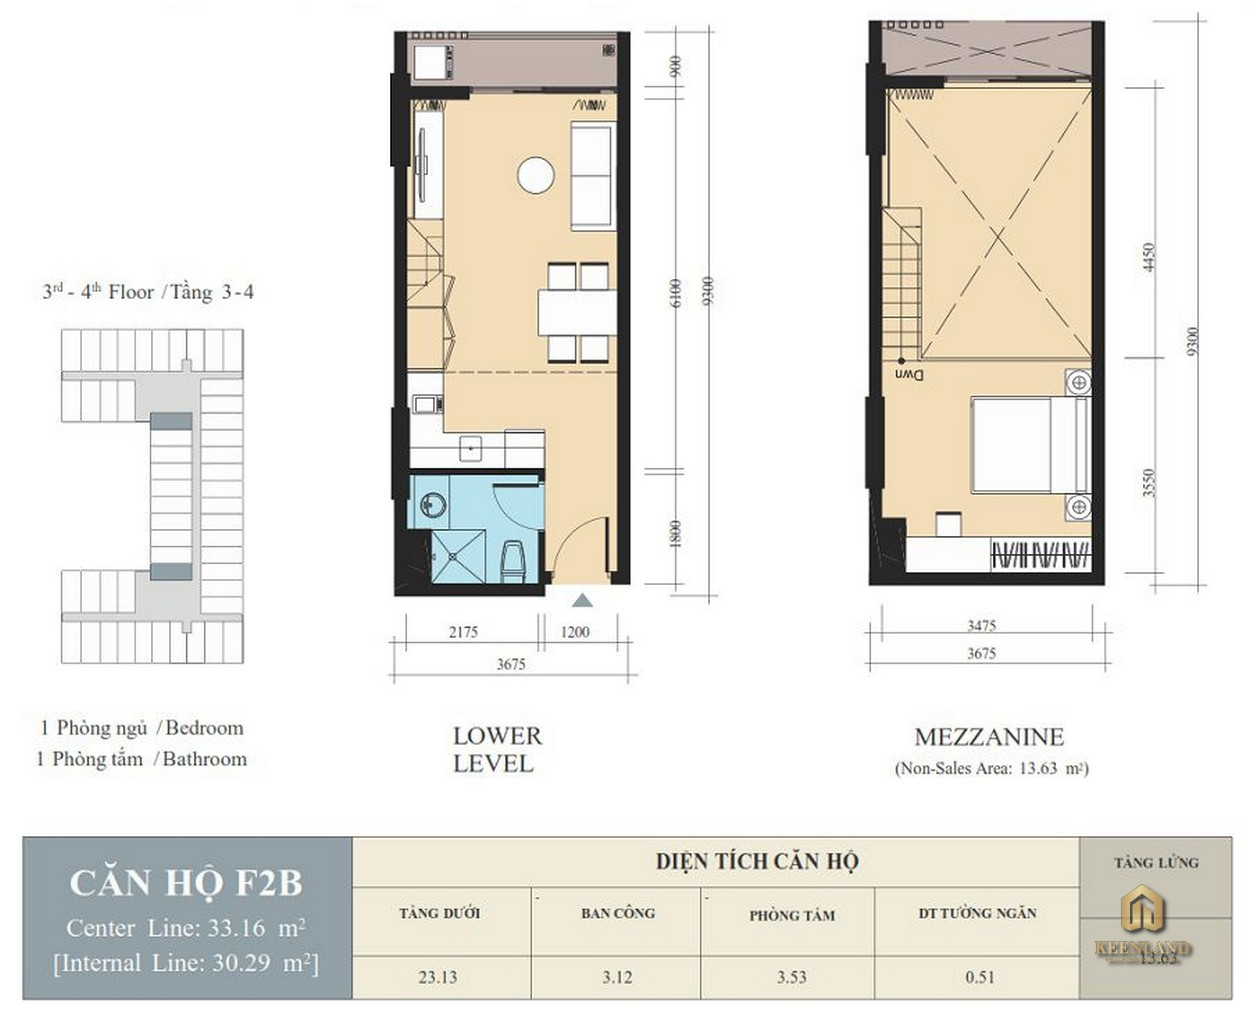 Thiết kế căn hộ F2B